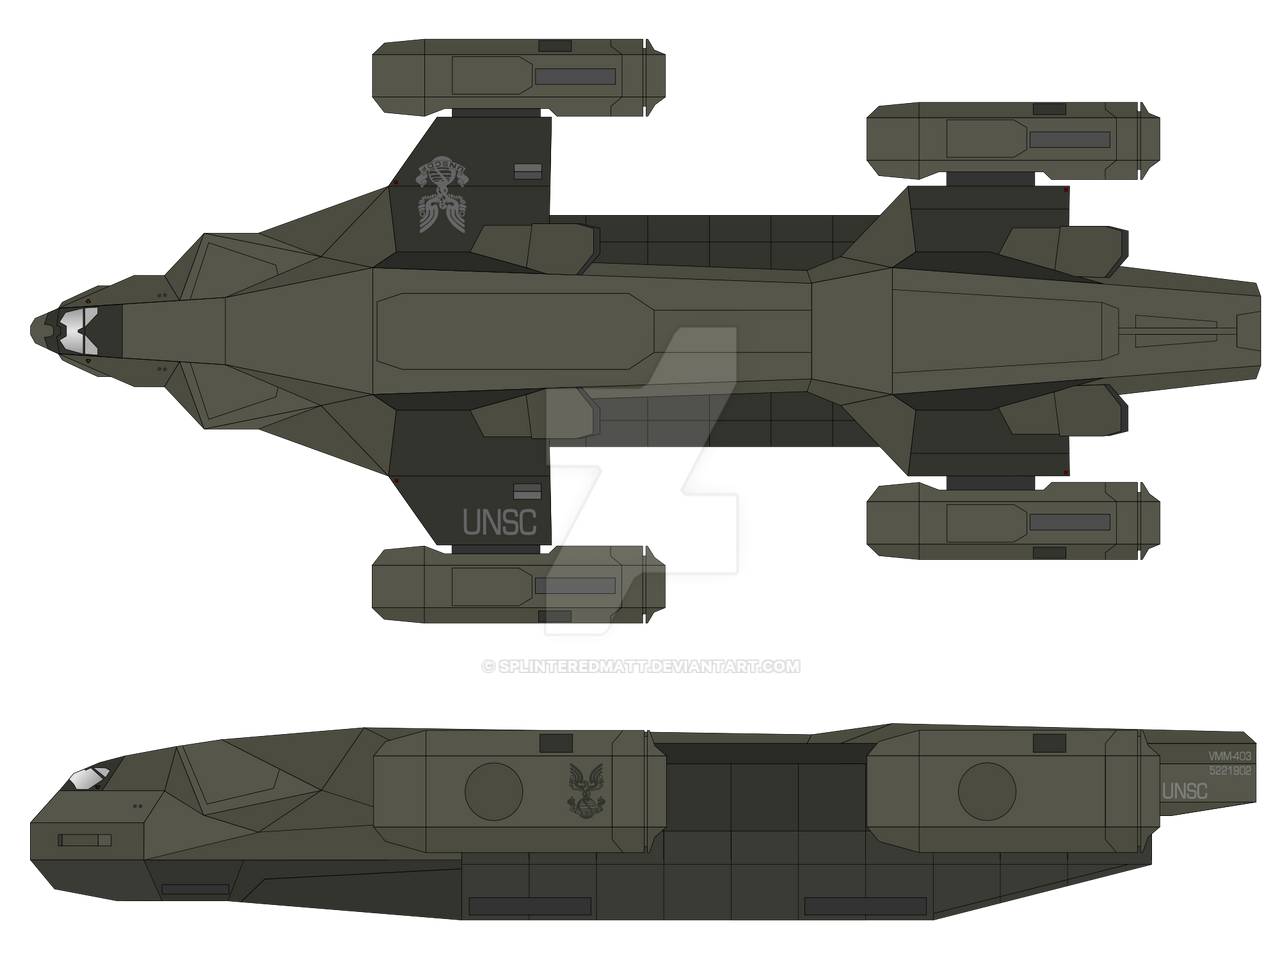 D-98 Osprey by SplinteredMatt